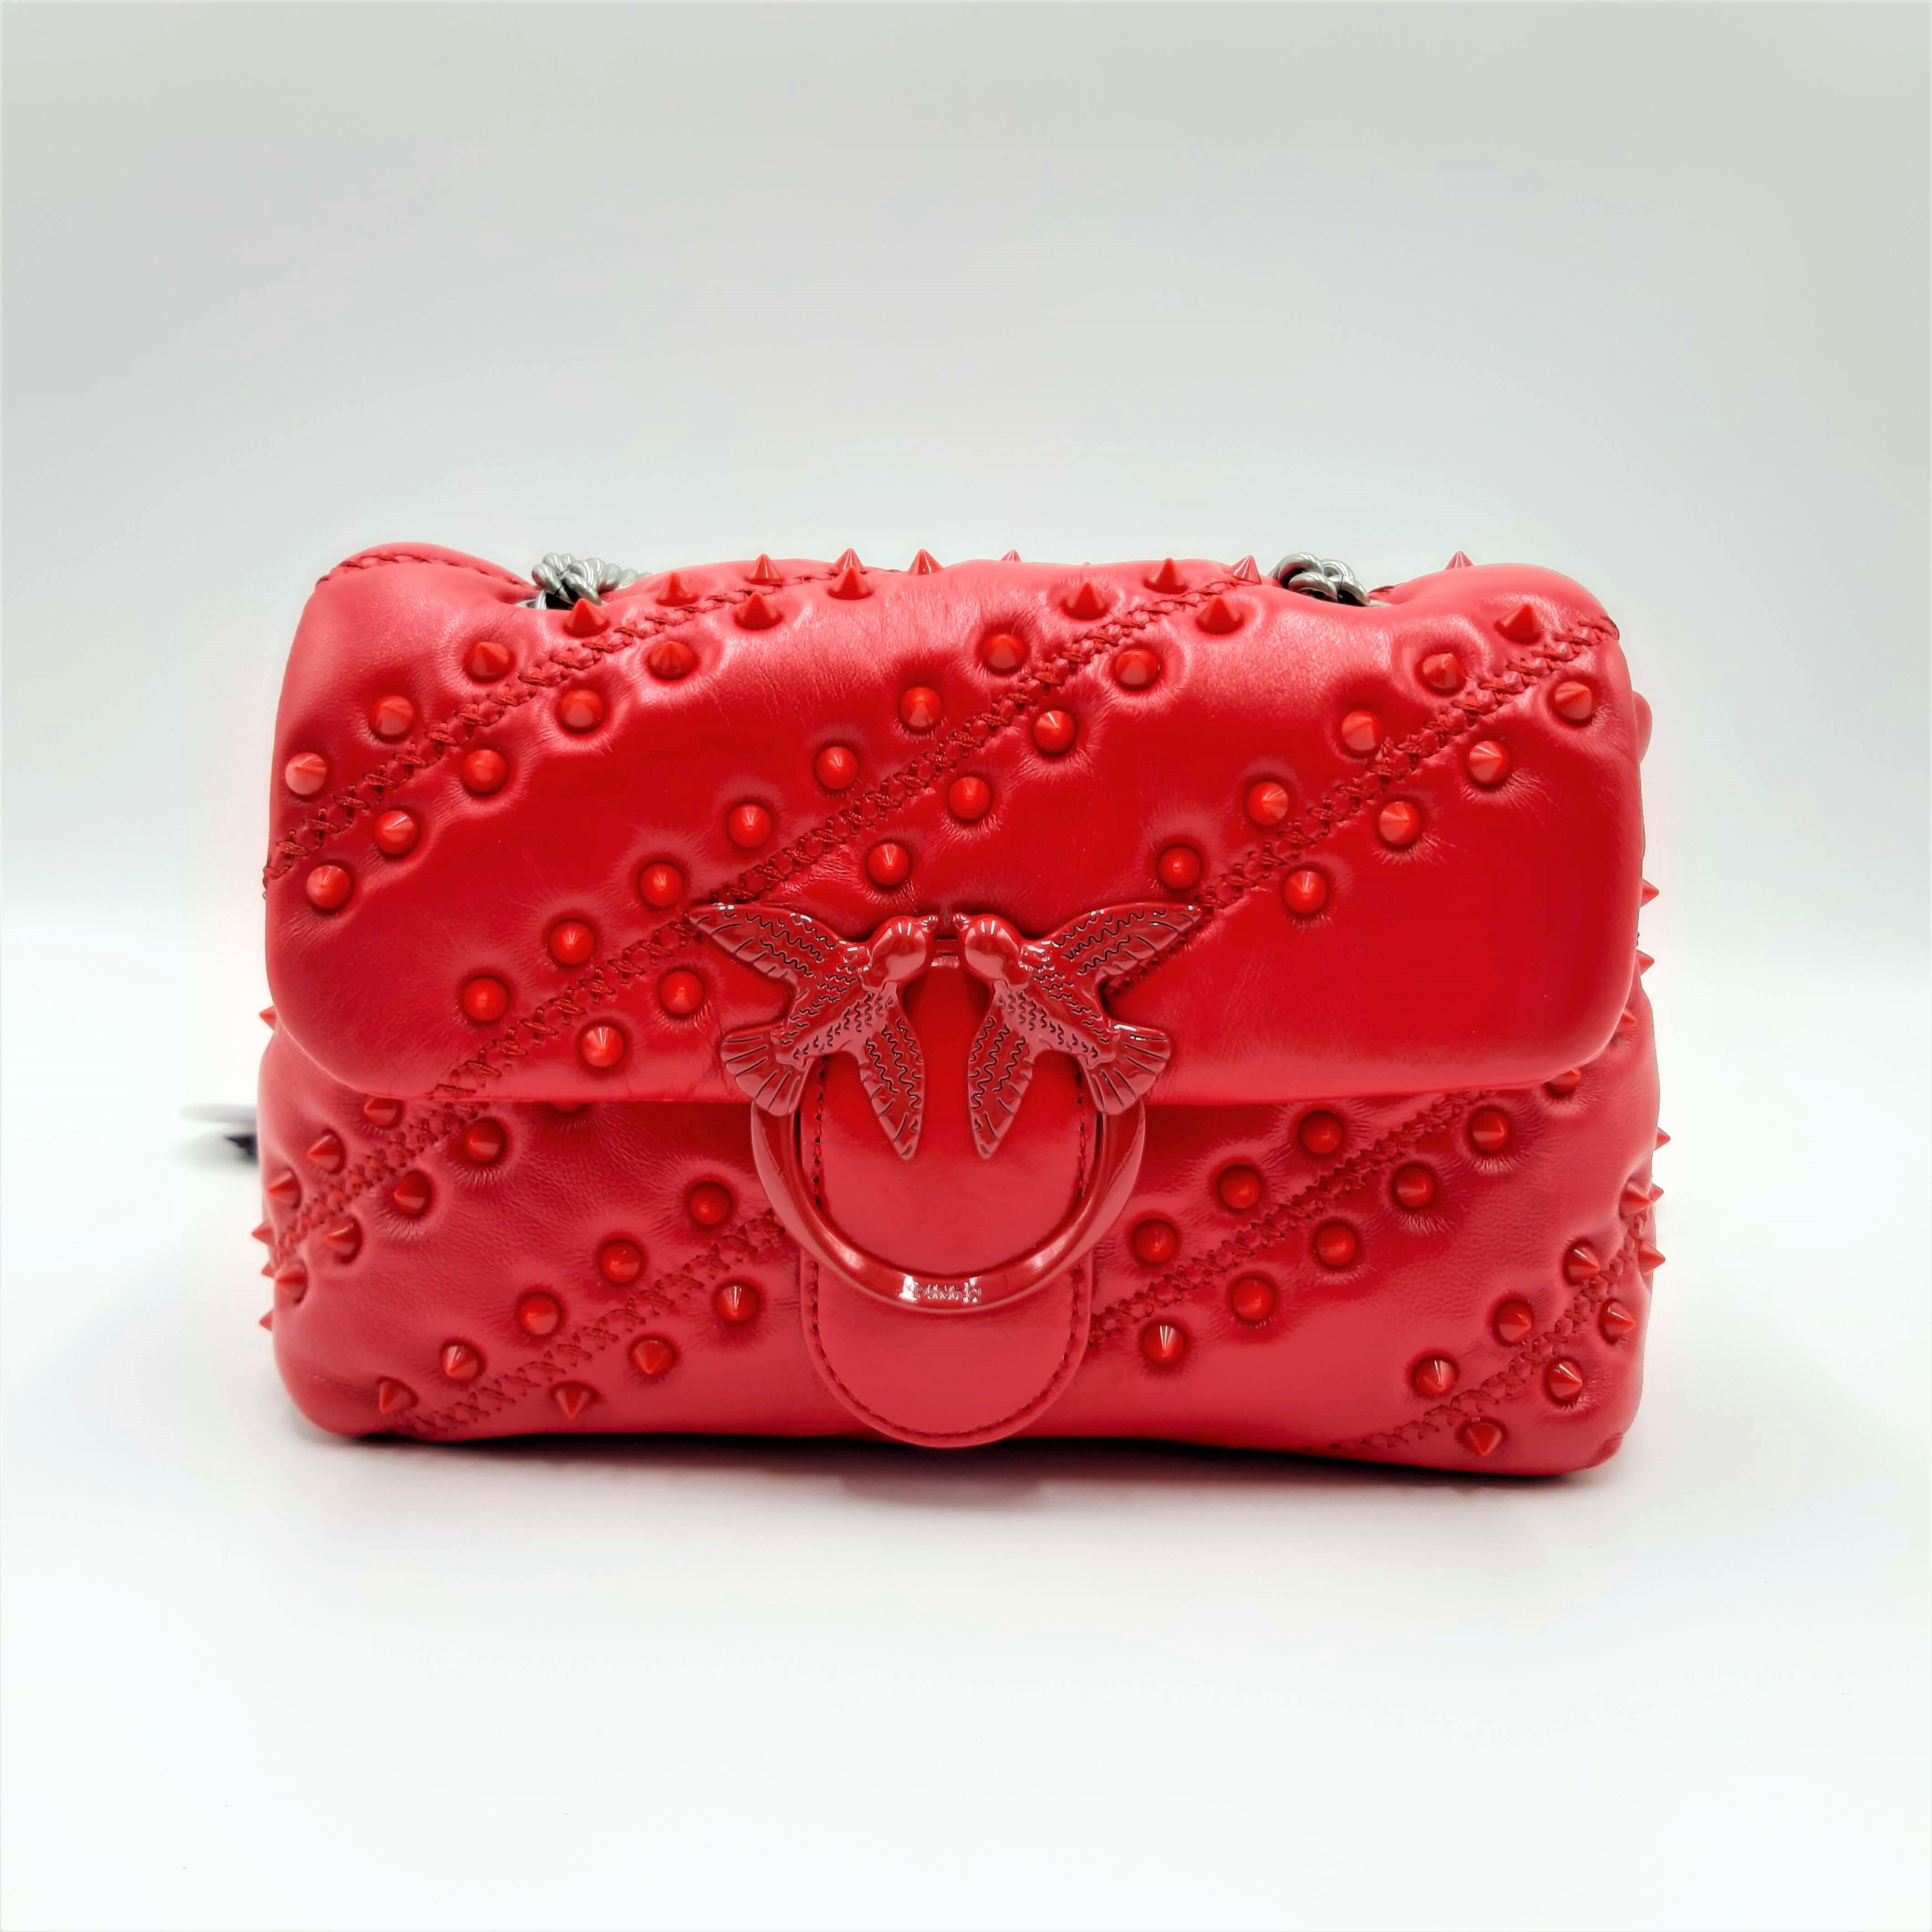 Borsa Love Mini Puff Soft Studs CL rossa Pinko